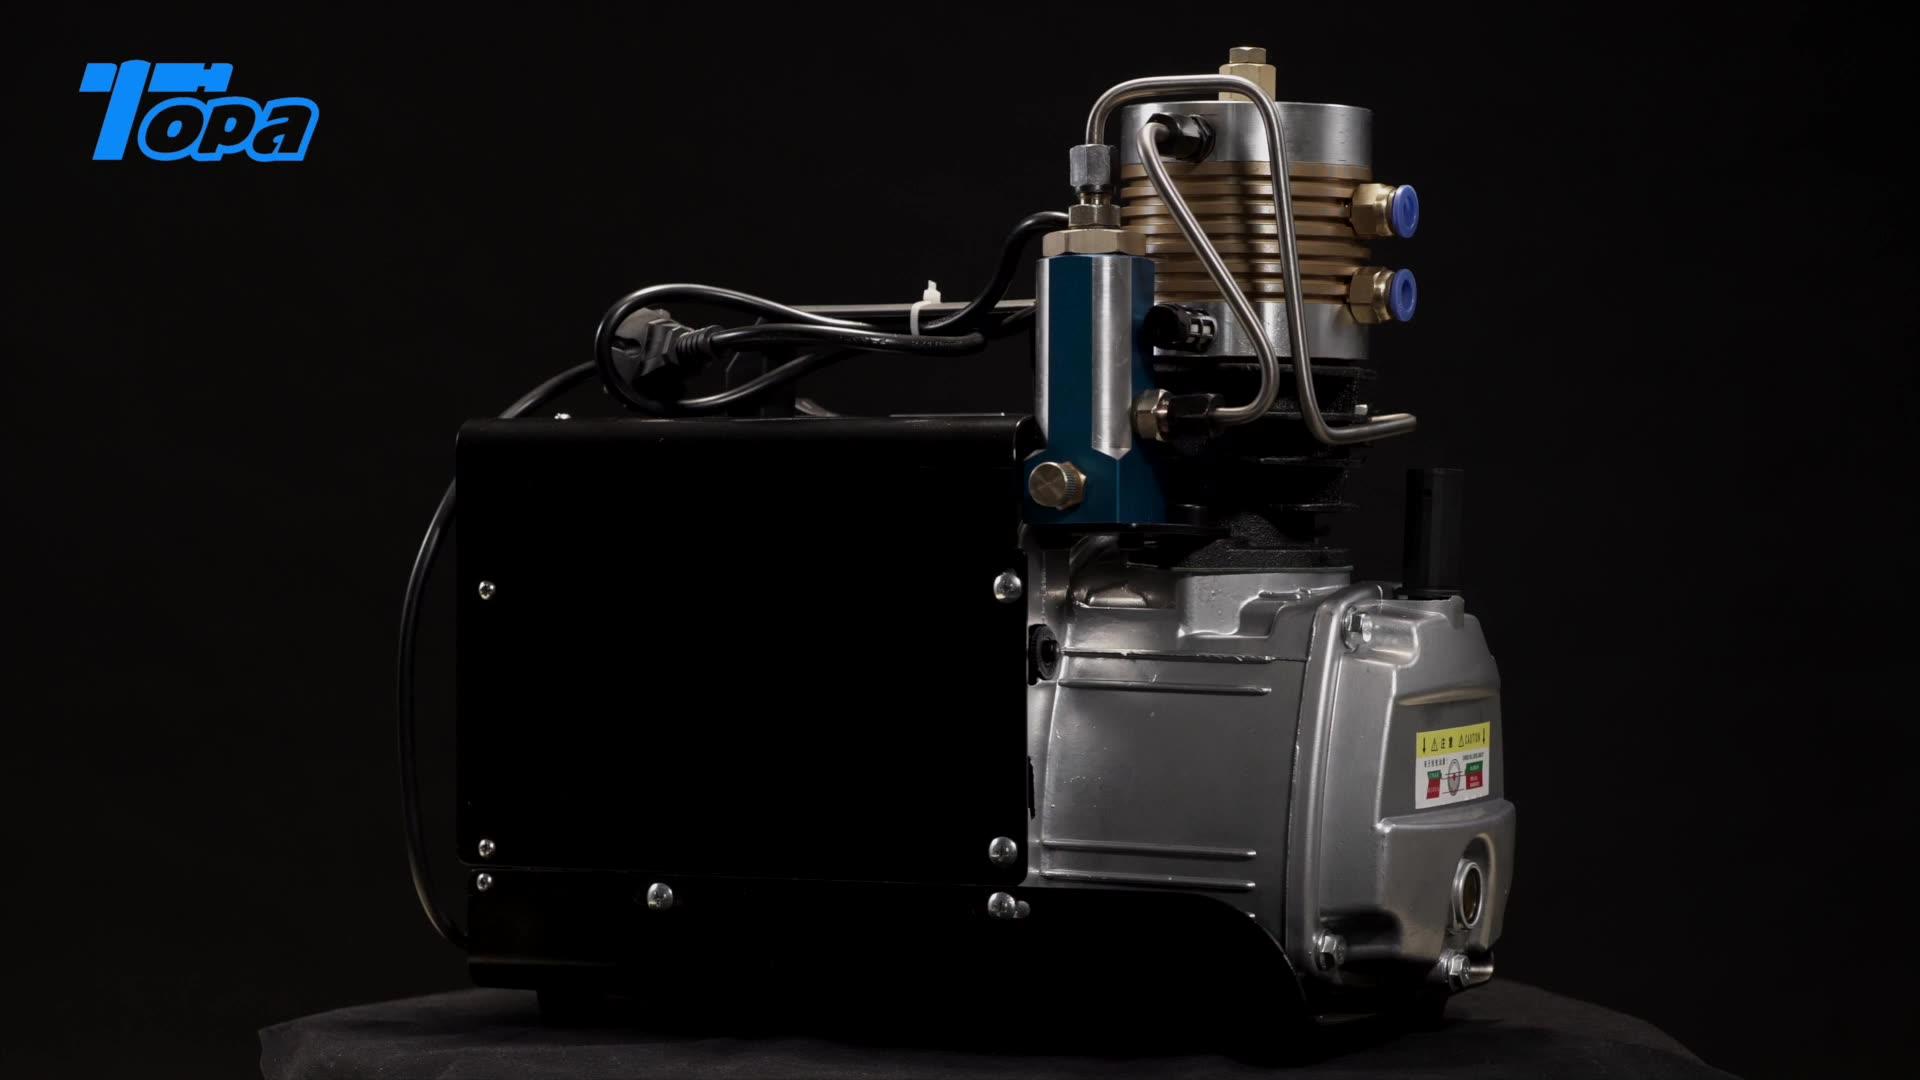 micro chinese 4500 psi high pressure electric 300bar air compressor